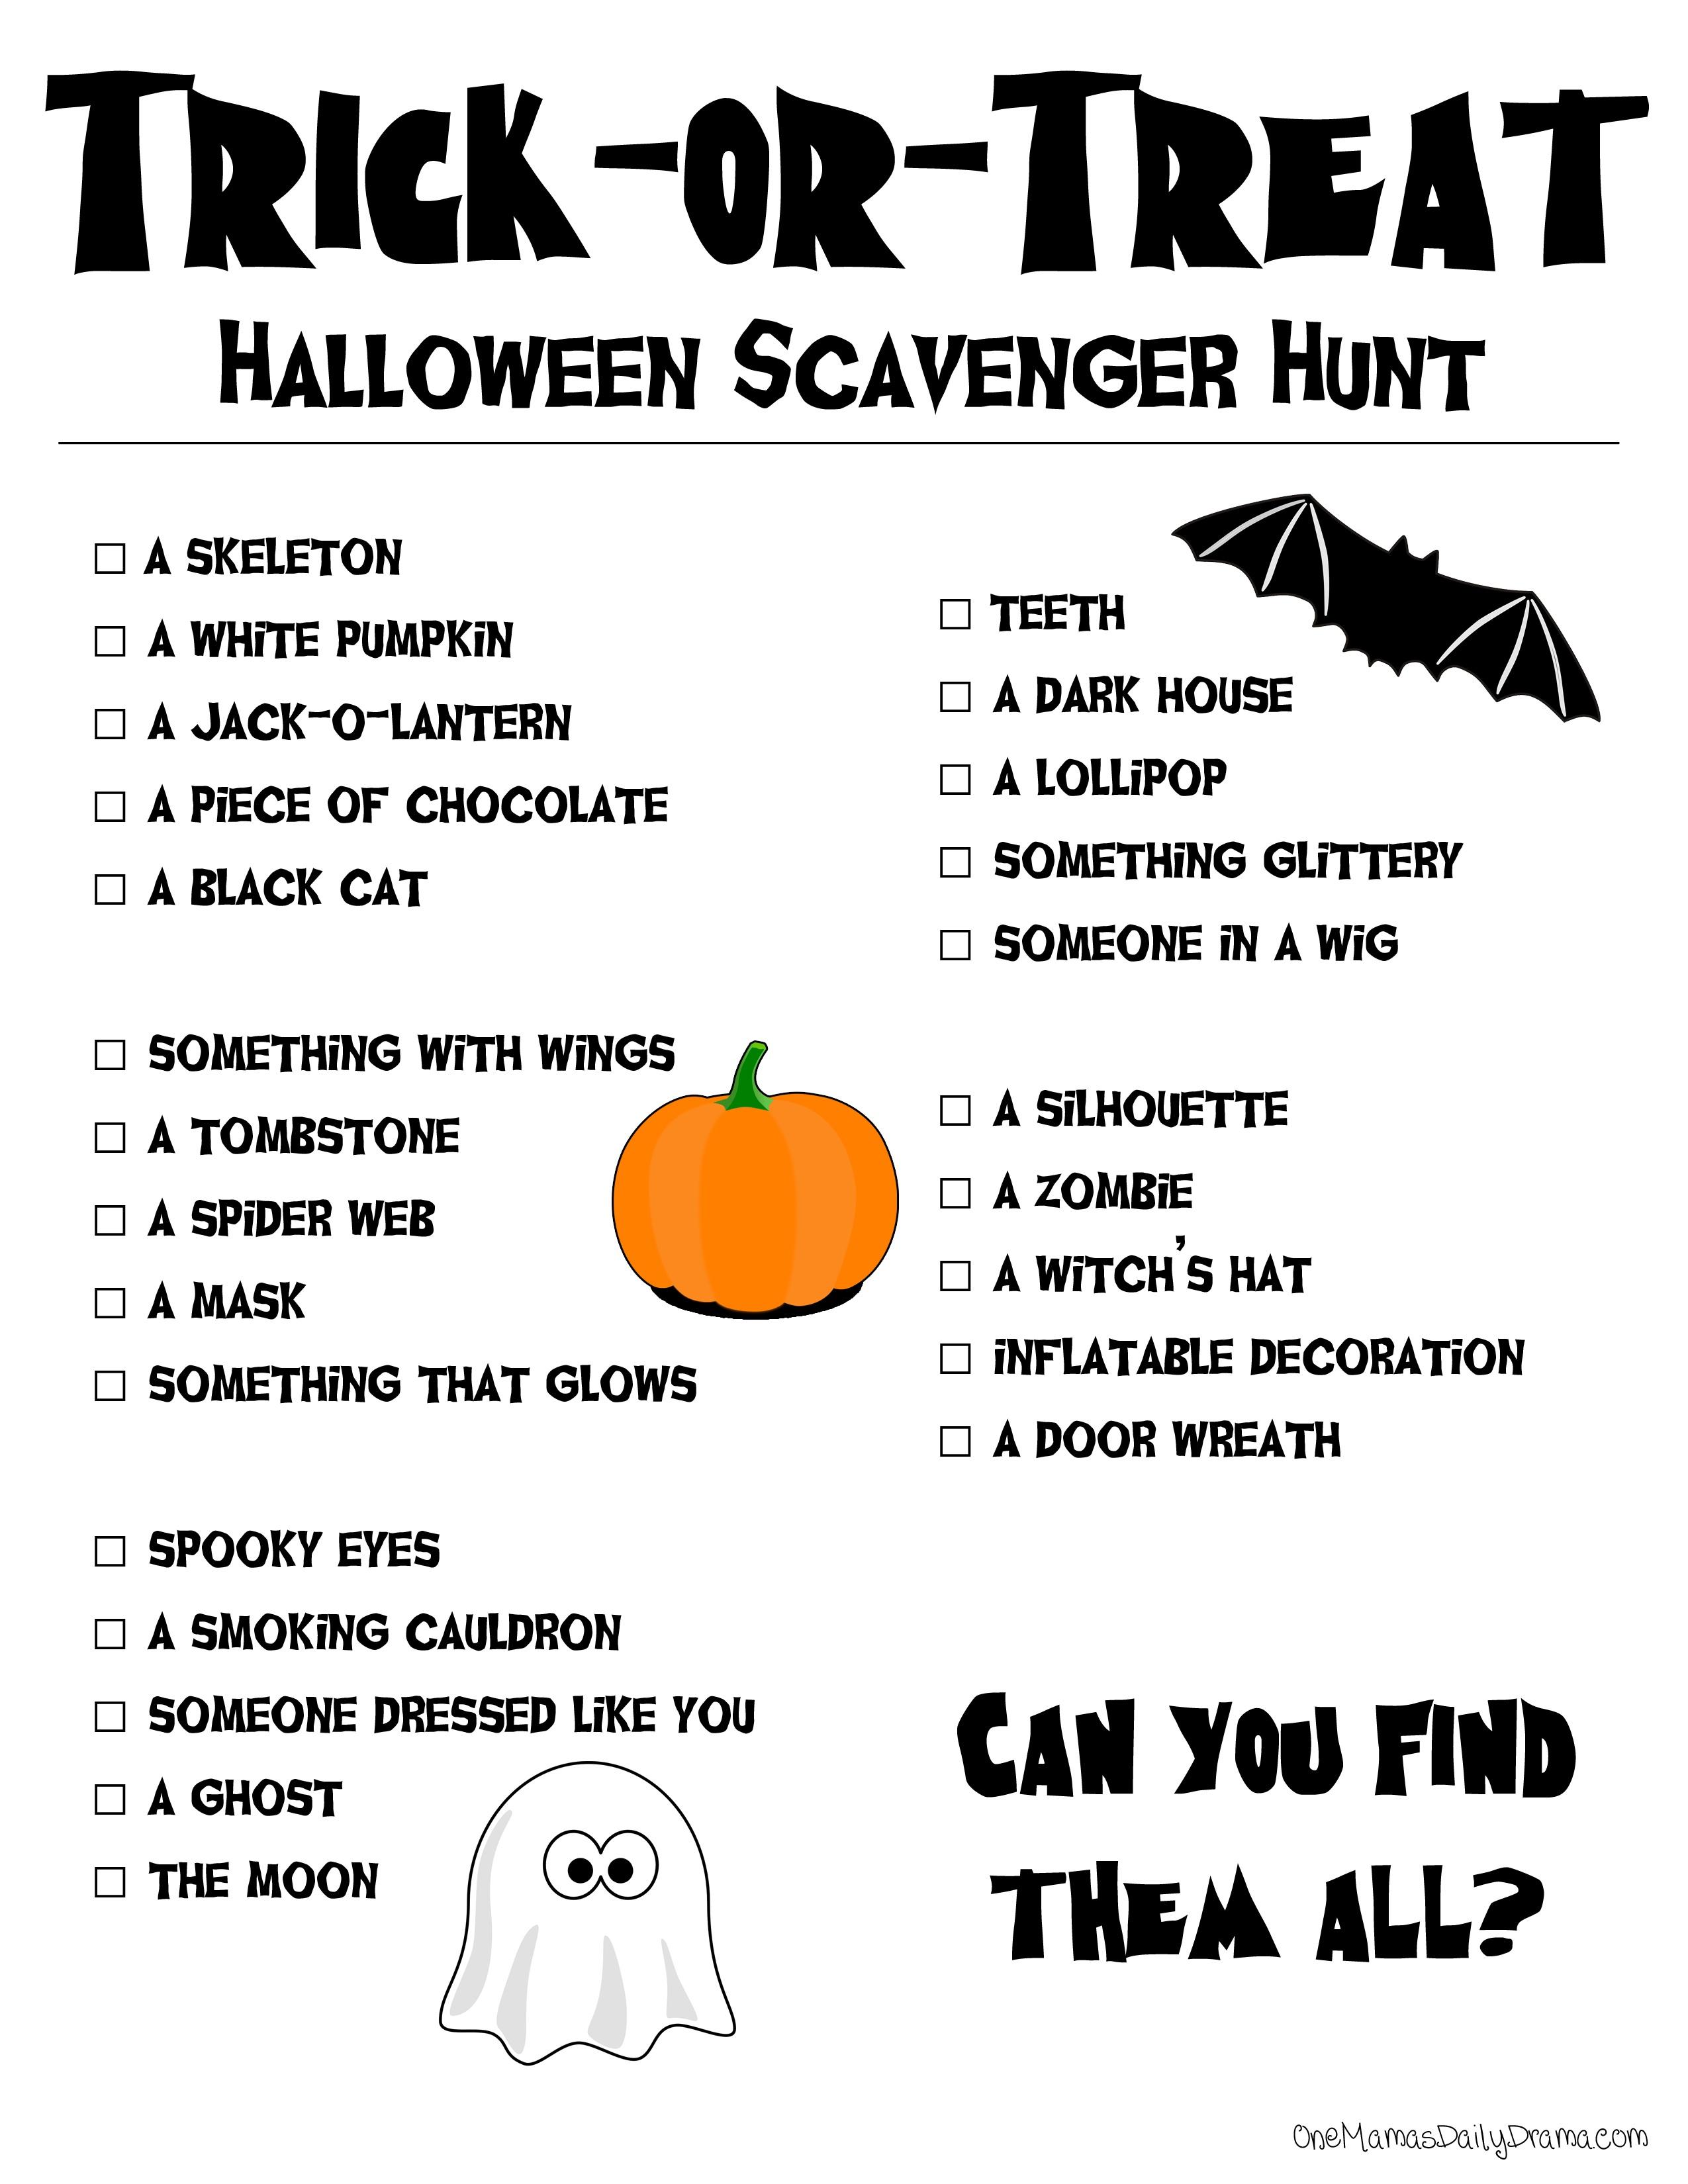 Printable Halloween Scavenger Hunt - Free Printable Halloween Scavenger Hunt